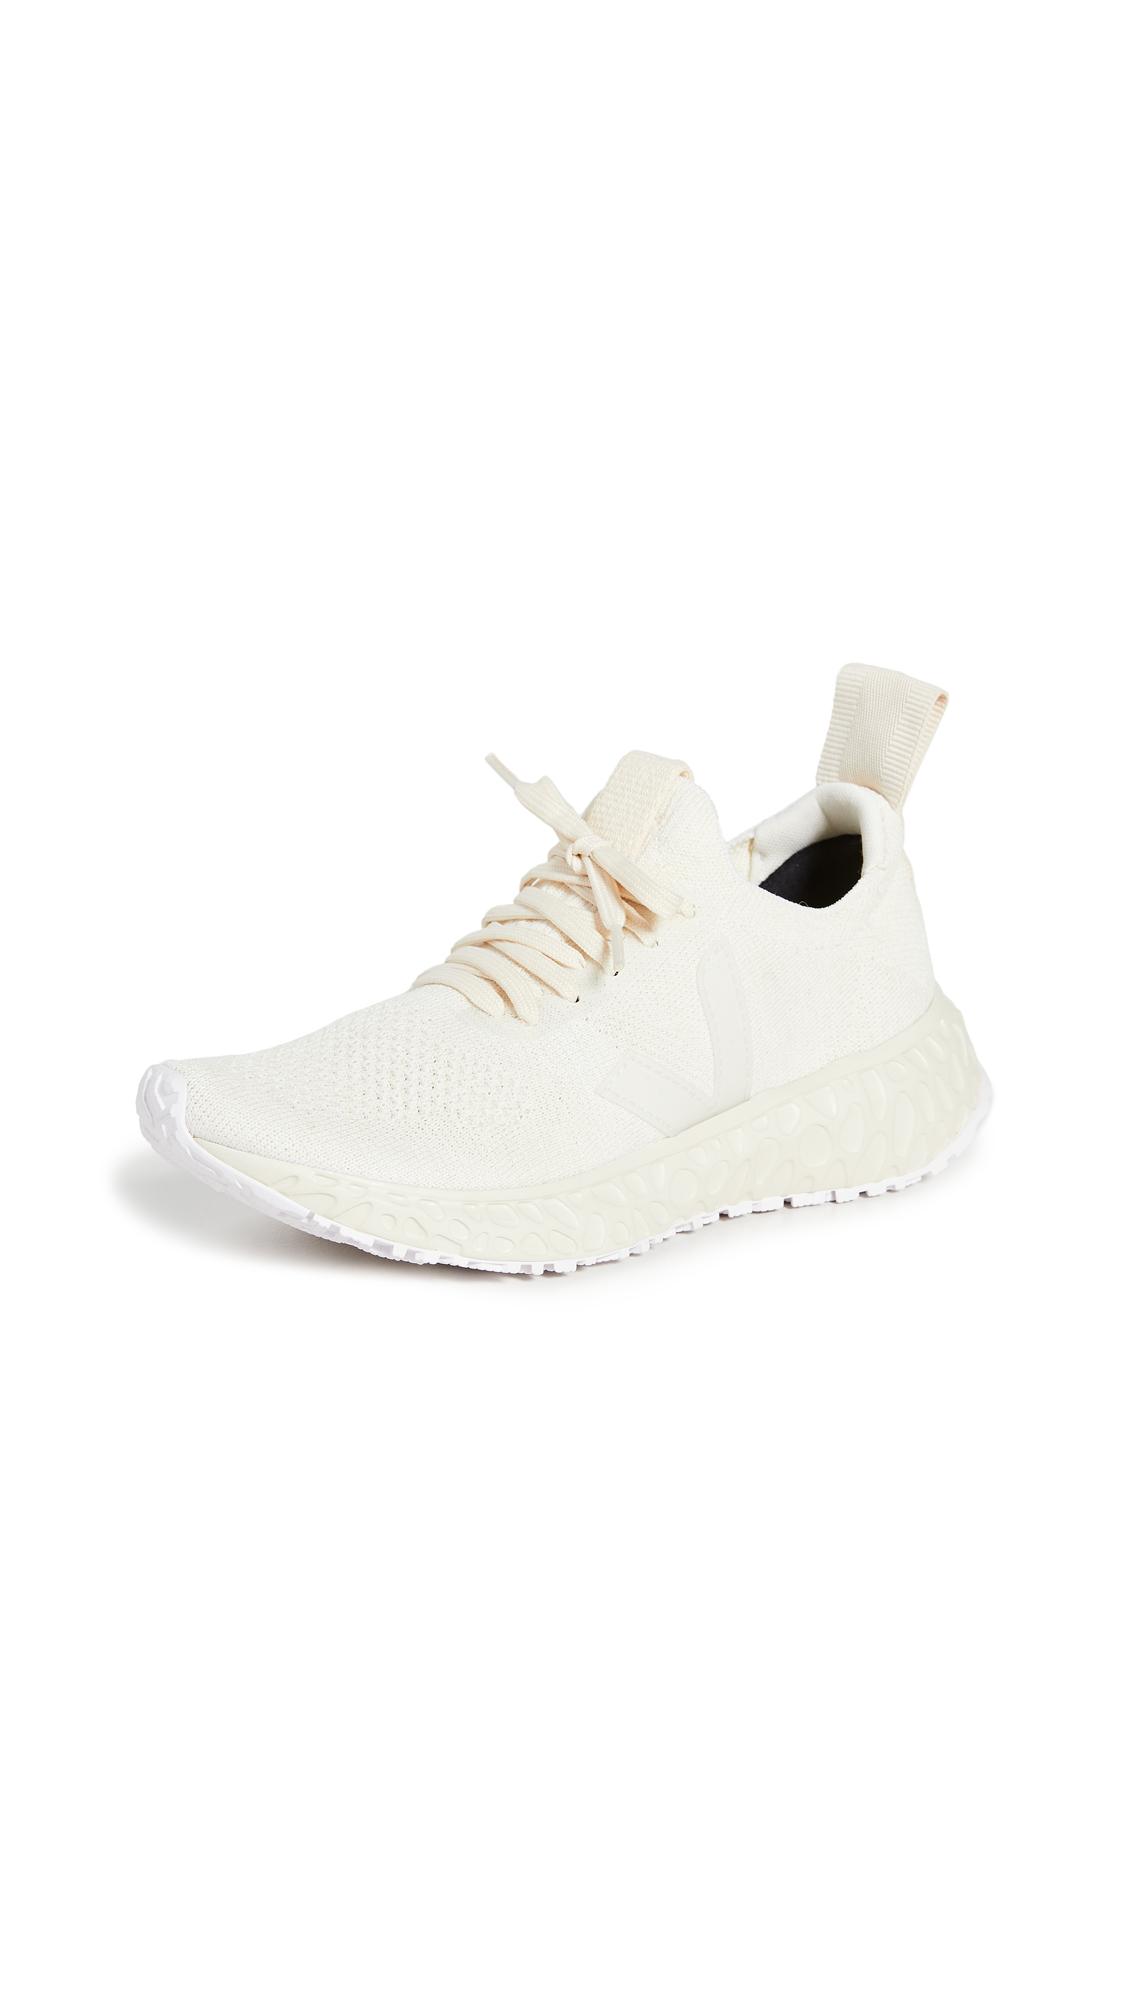 Veja x Rick Owens Runner Style Sneakers - 25% Off Sale